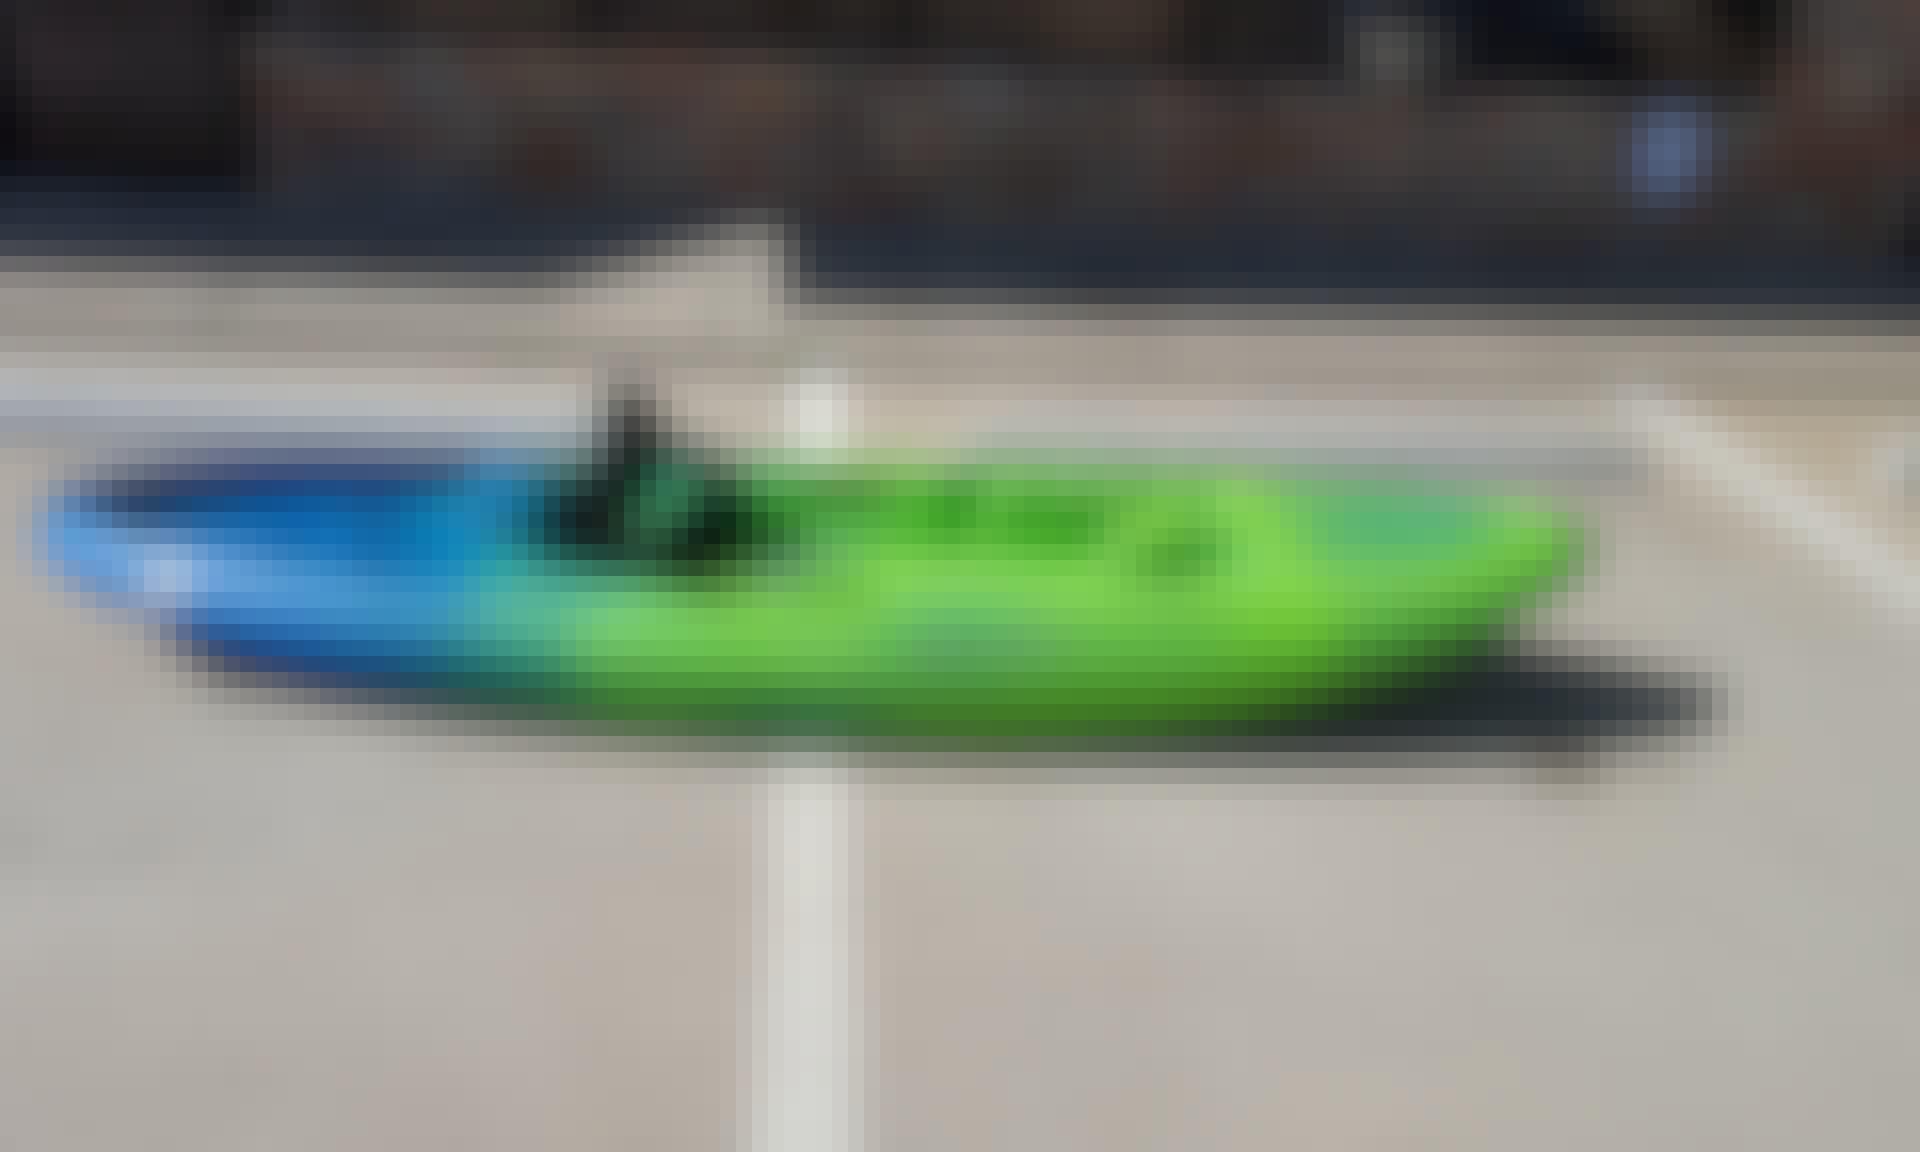 Single Kayak Rental in Cave Spring, Georgia